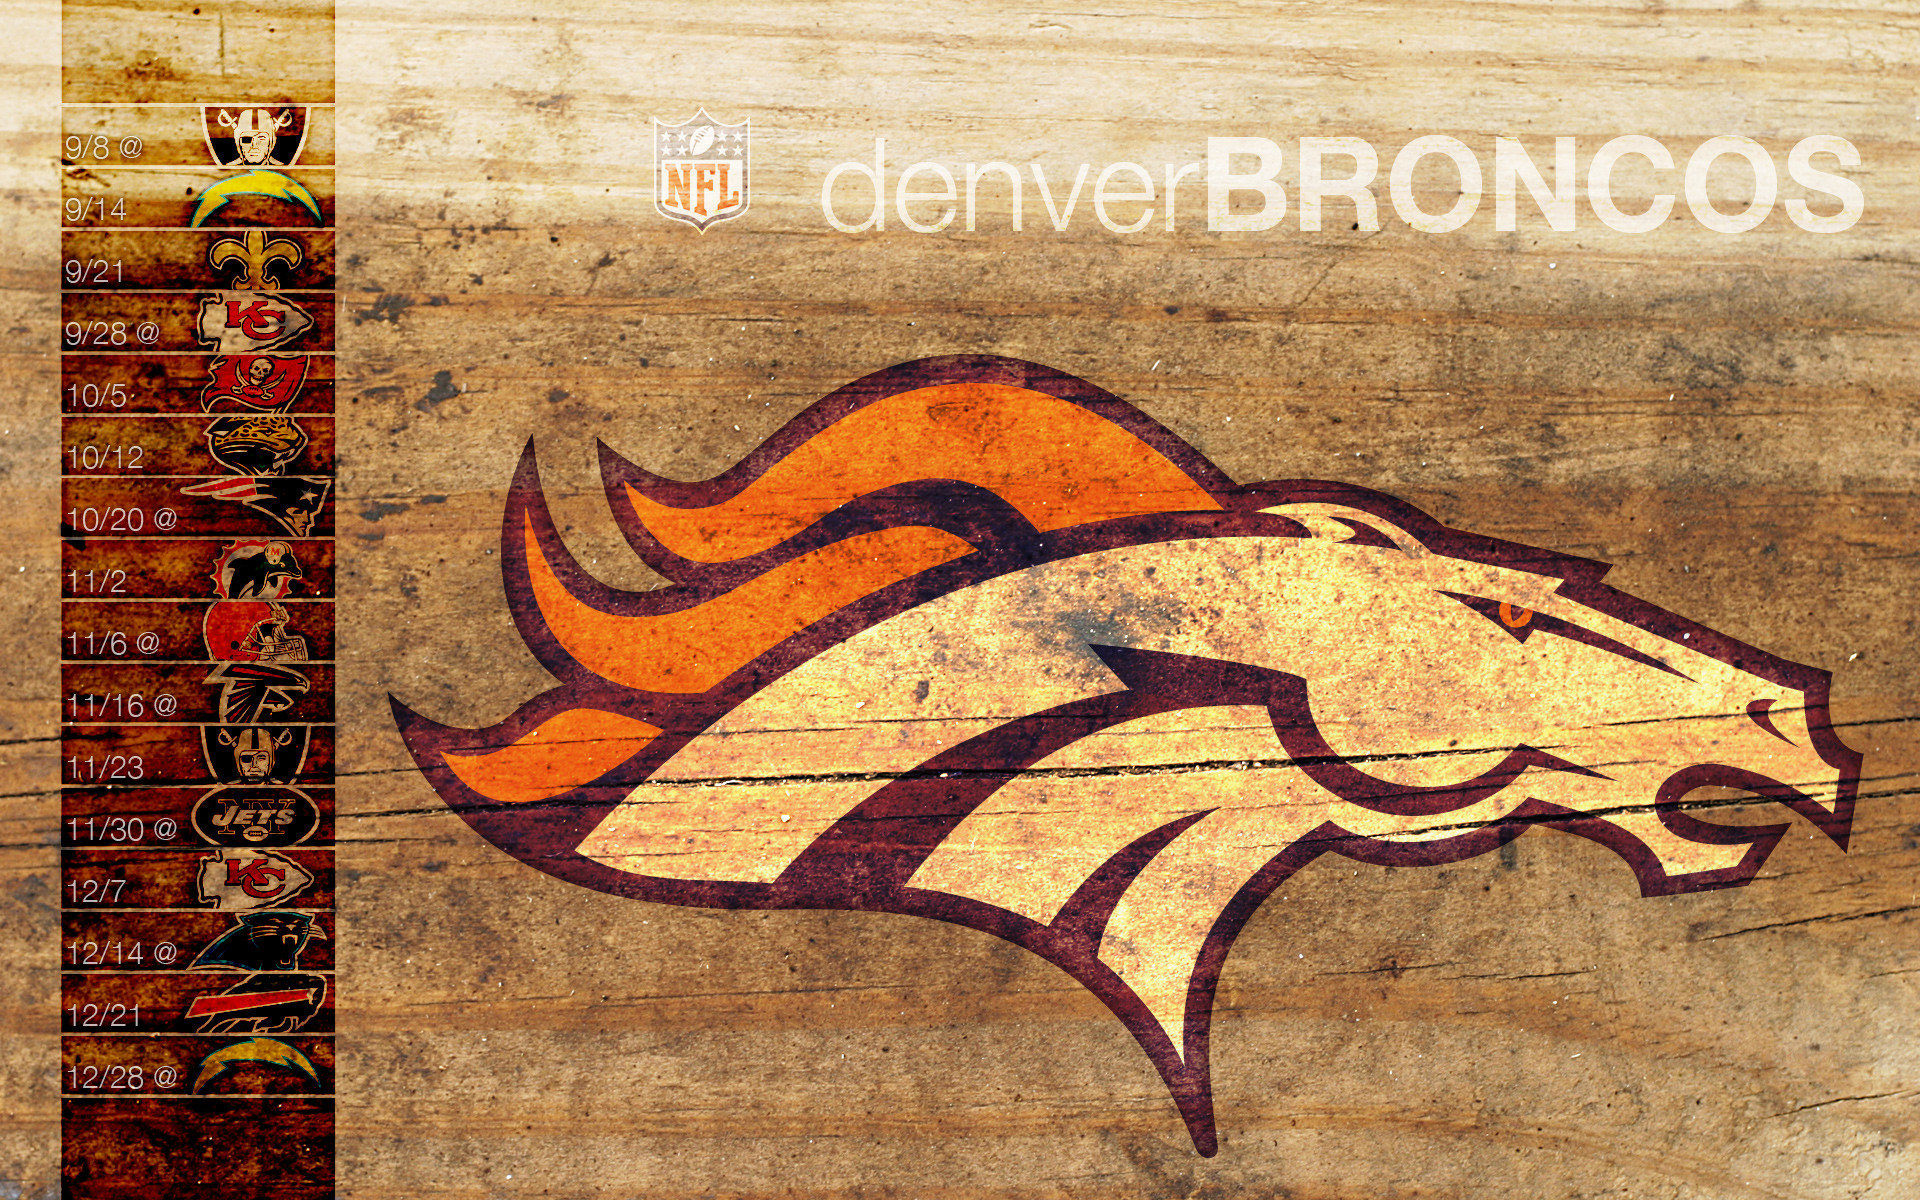 Denver-Broncos-2008-Schedule-Wallpaper-by-Hawk-Eyes